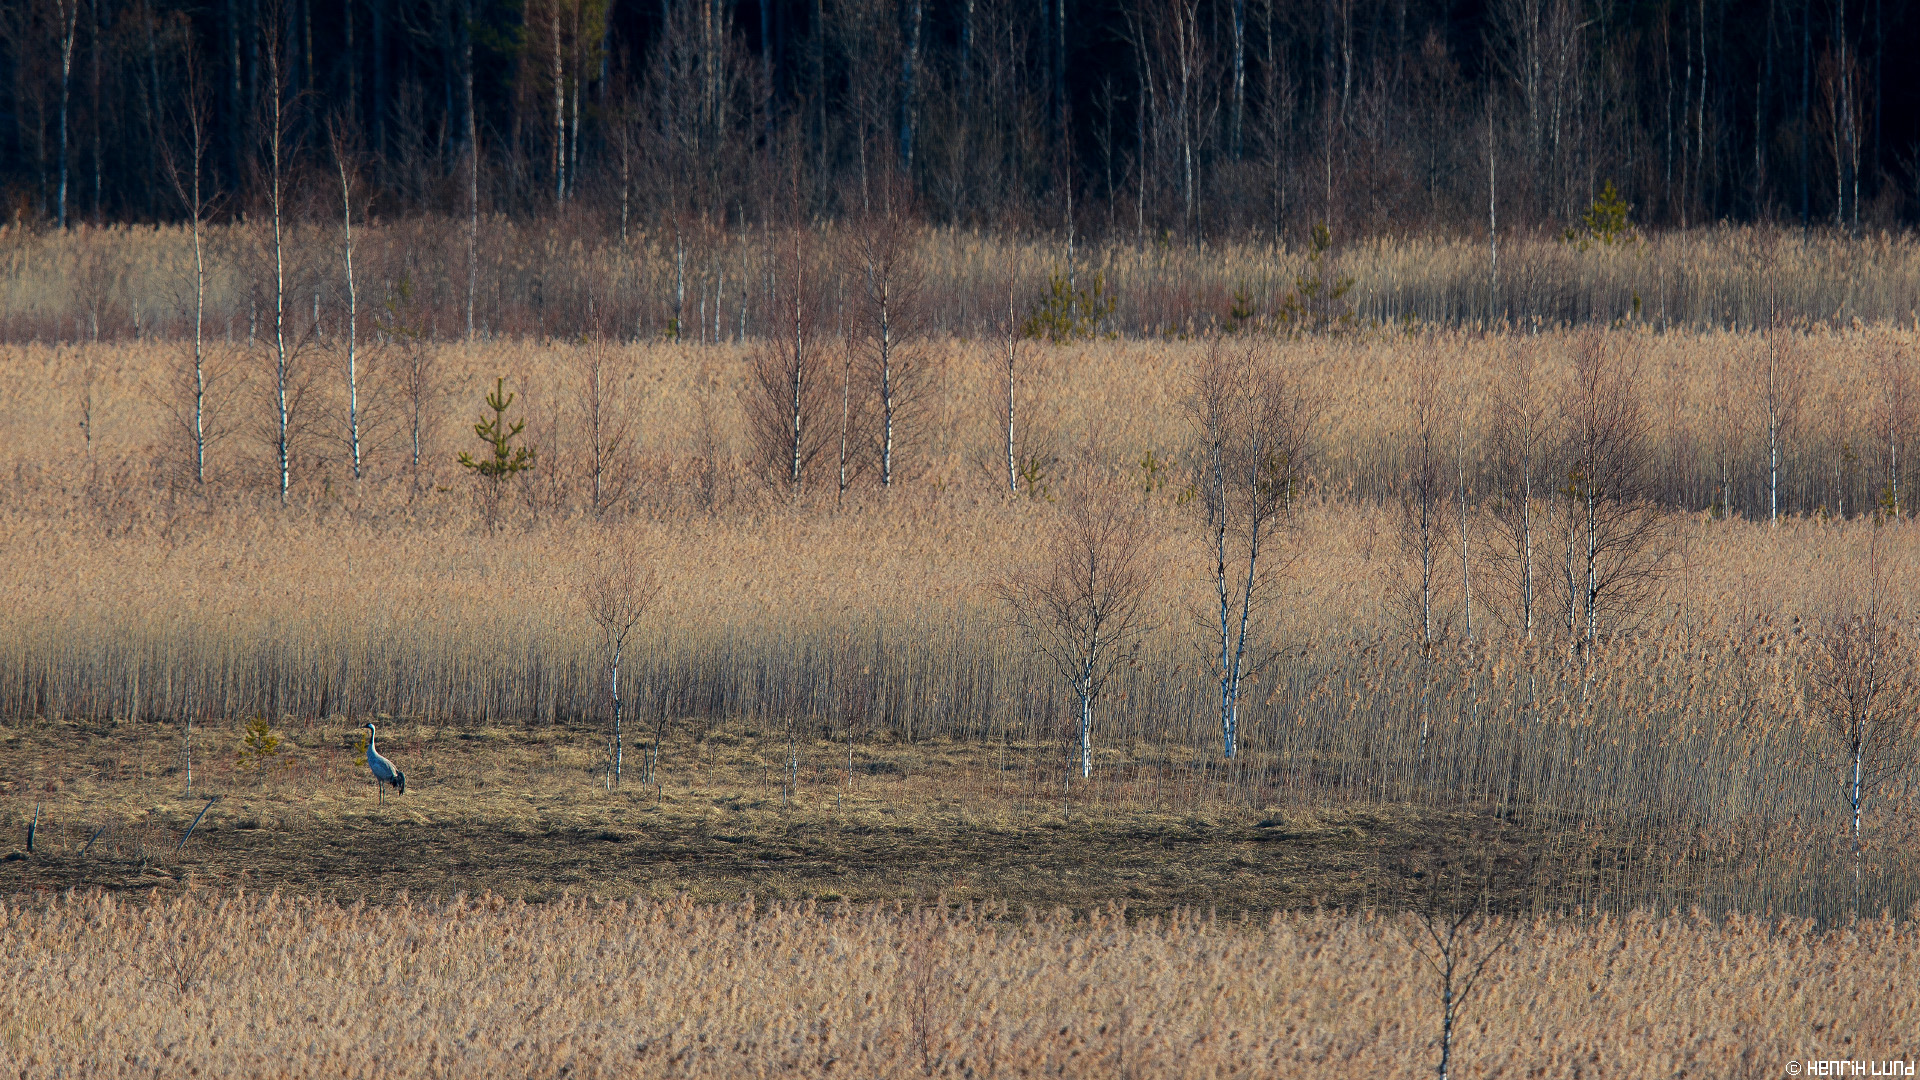 Common Crane arrival to southern Finland. Artjärvi, Finland. April 2016.